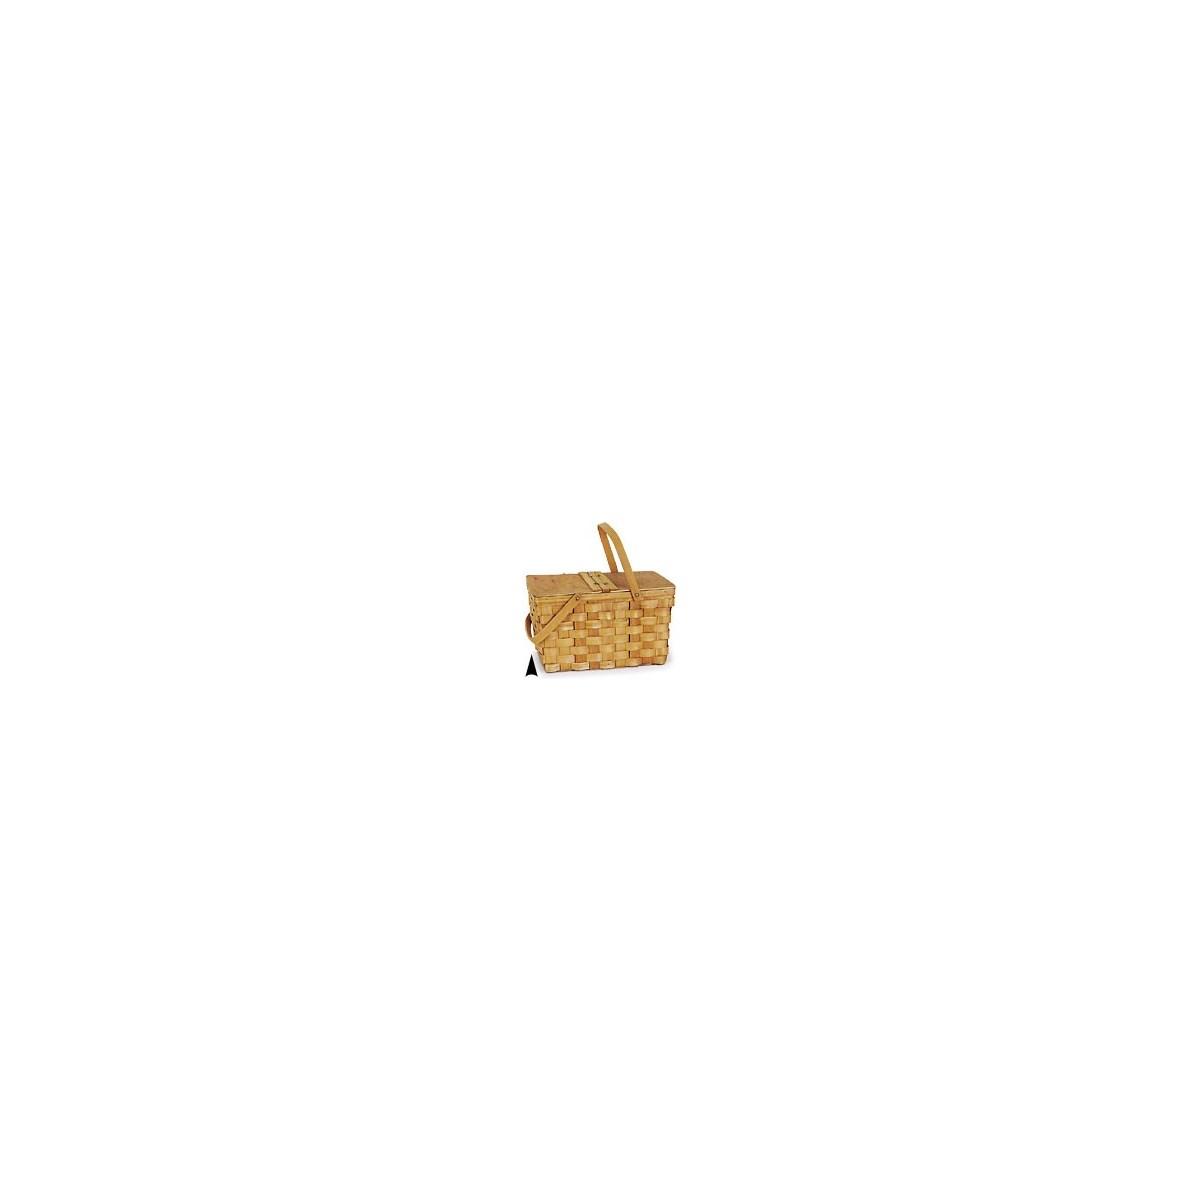 5/215 WOOD PICNIC BASKET CS. PK.: 8